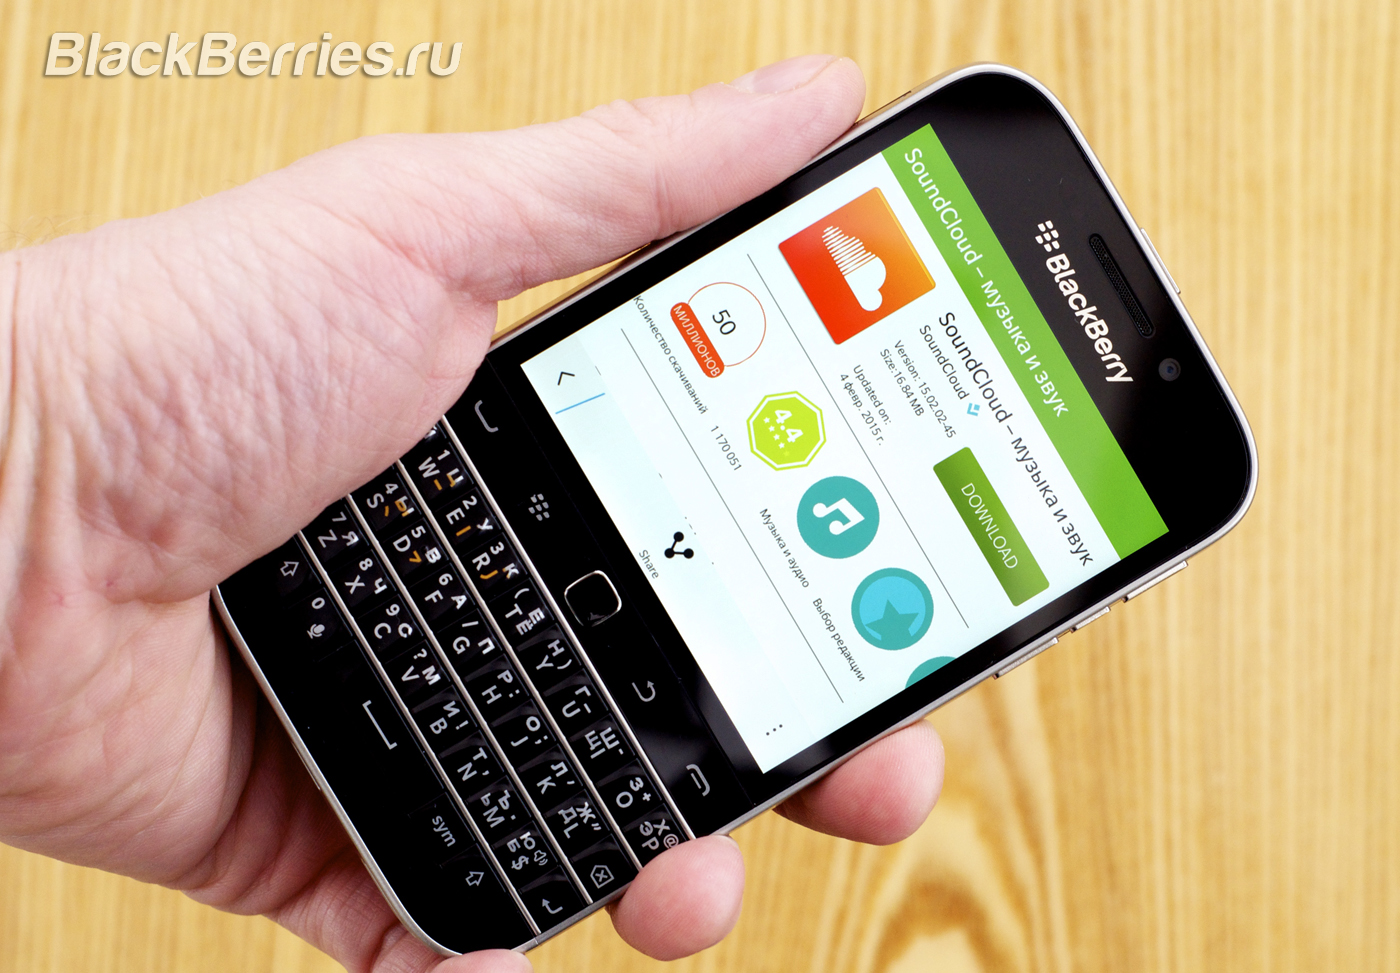 BlackBerry-Classic-Snap